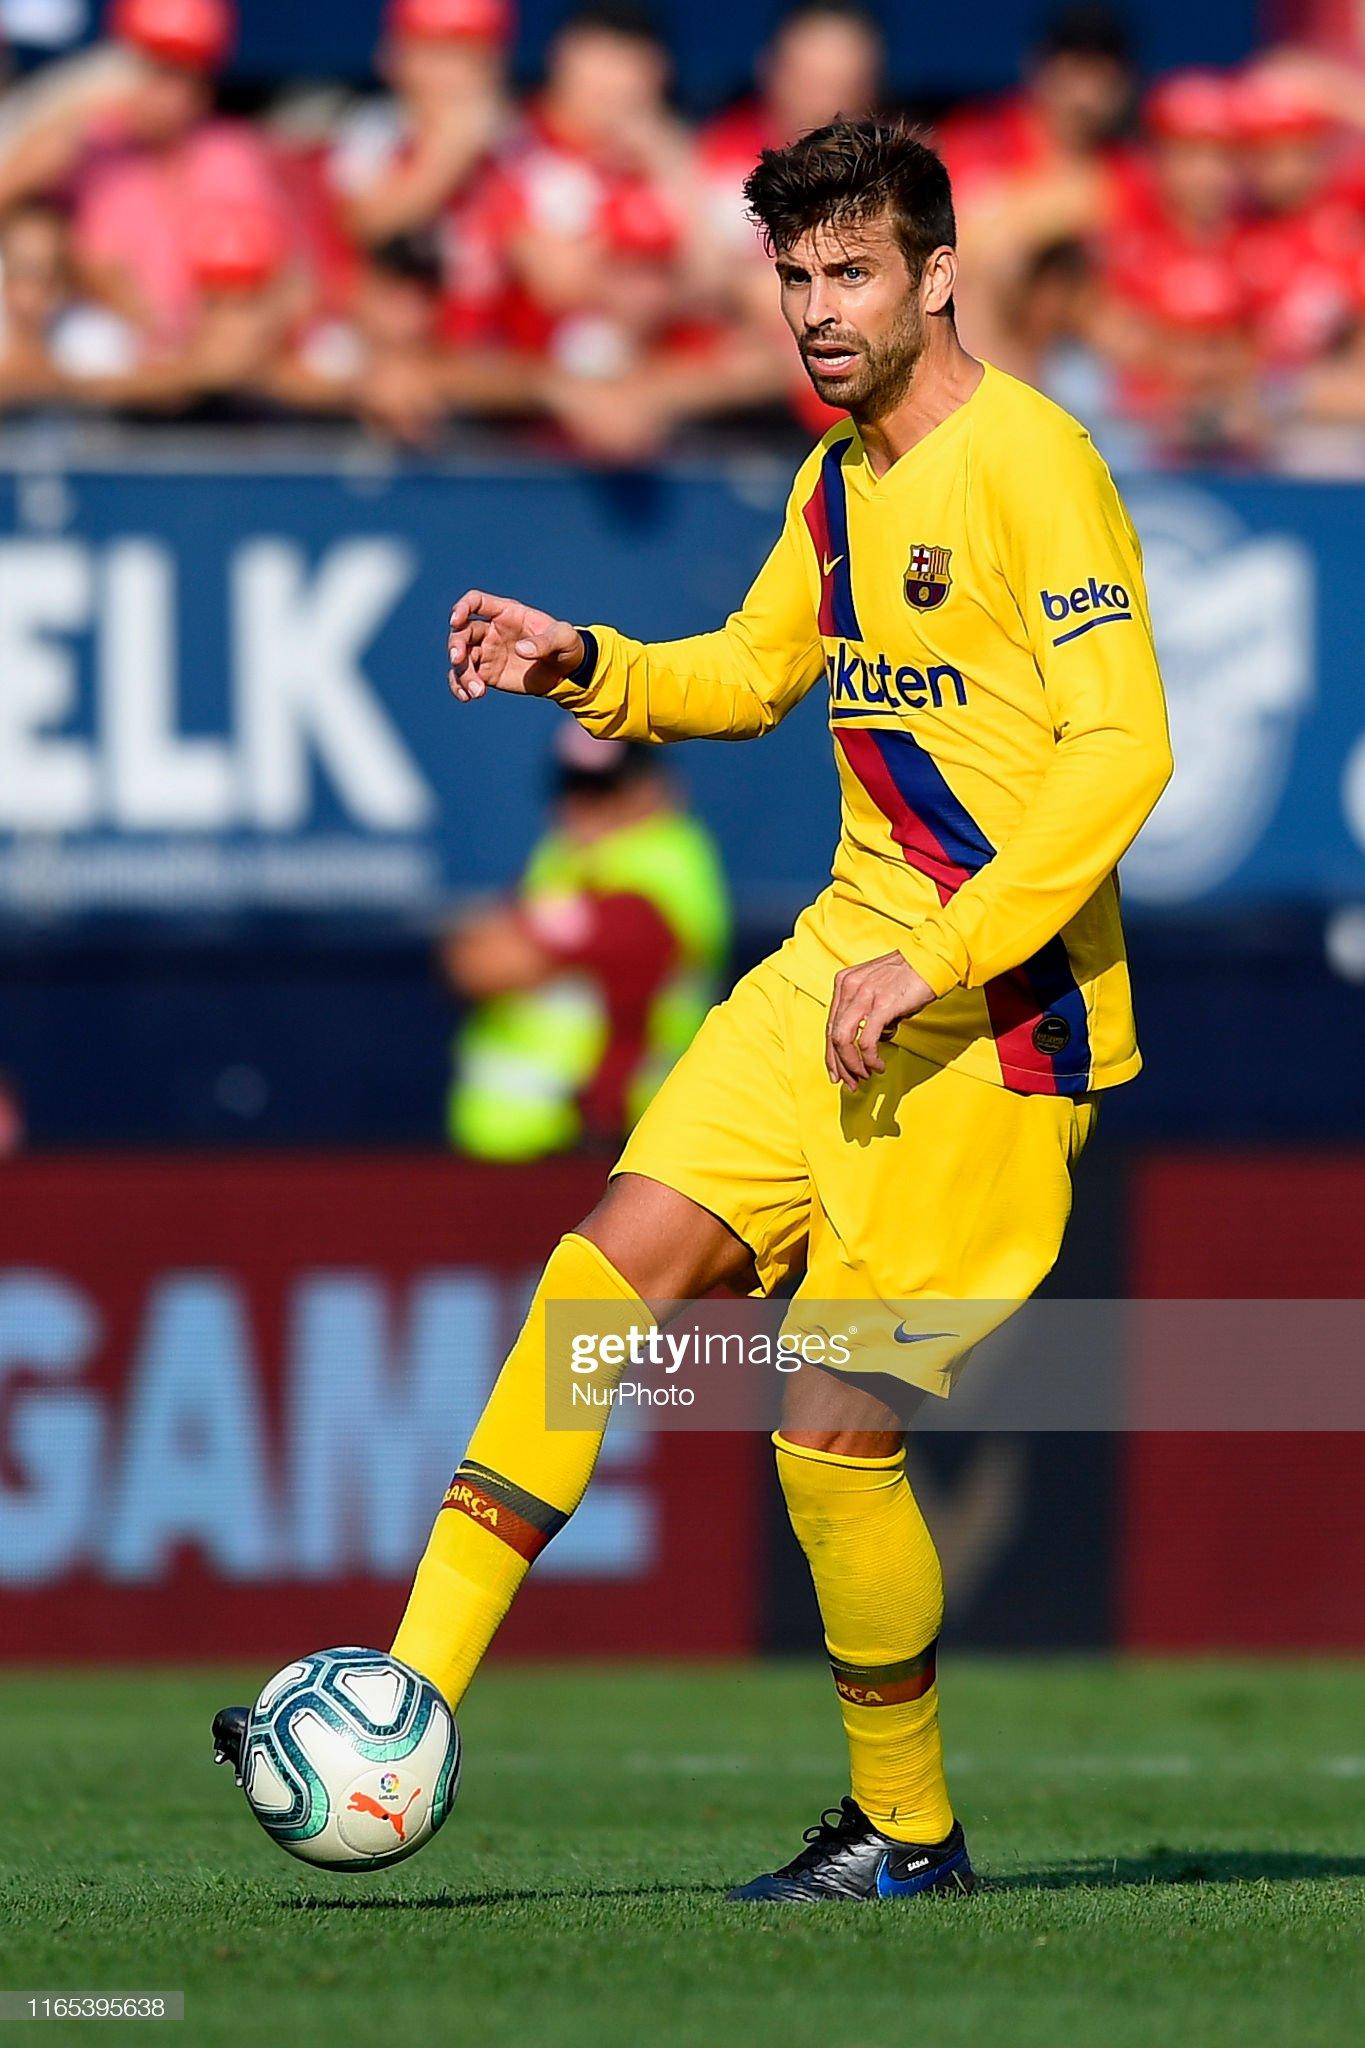 صور مباراة : أوساسونا - برشلونة 2-2 ( 31-08-2019 )  Gerard-pique-of-barcelona-in-action-during-the-liga-match-between-ca-picture-id1165395638?s=2048x2048